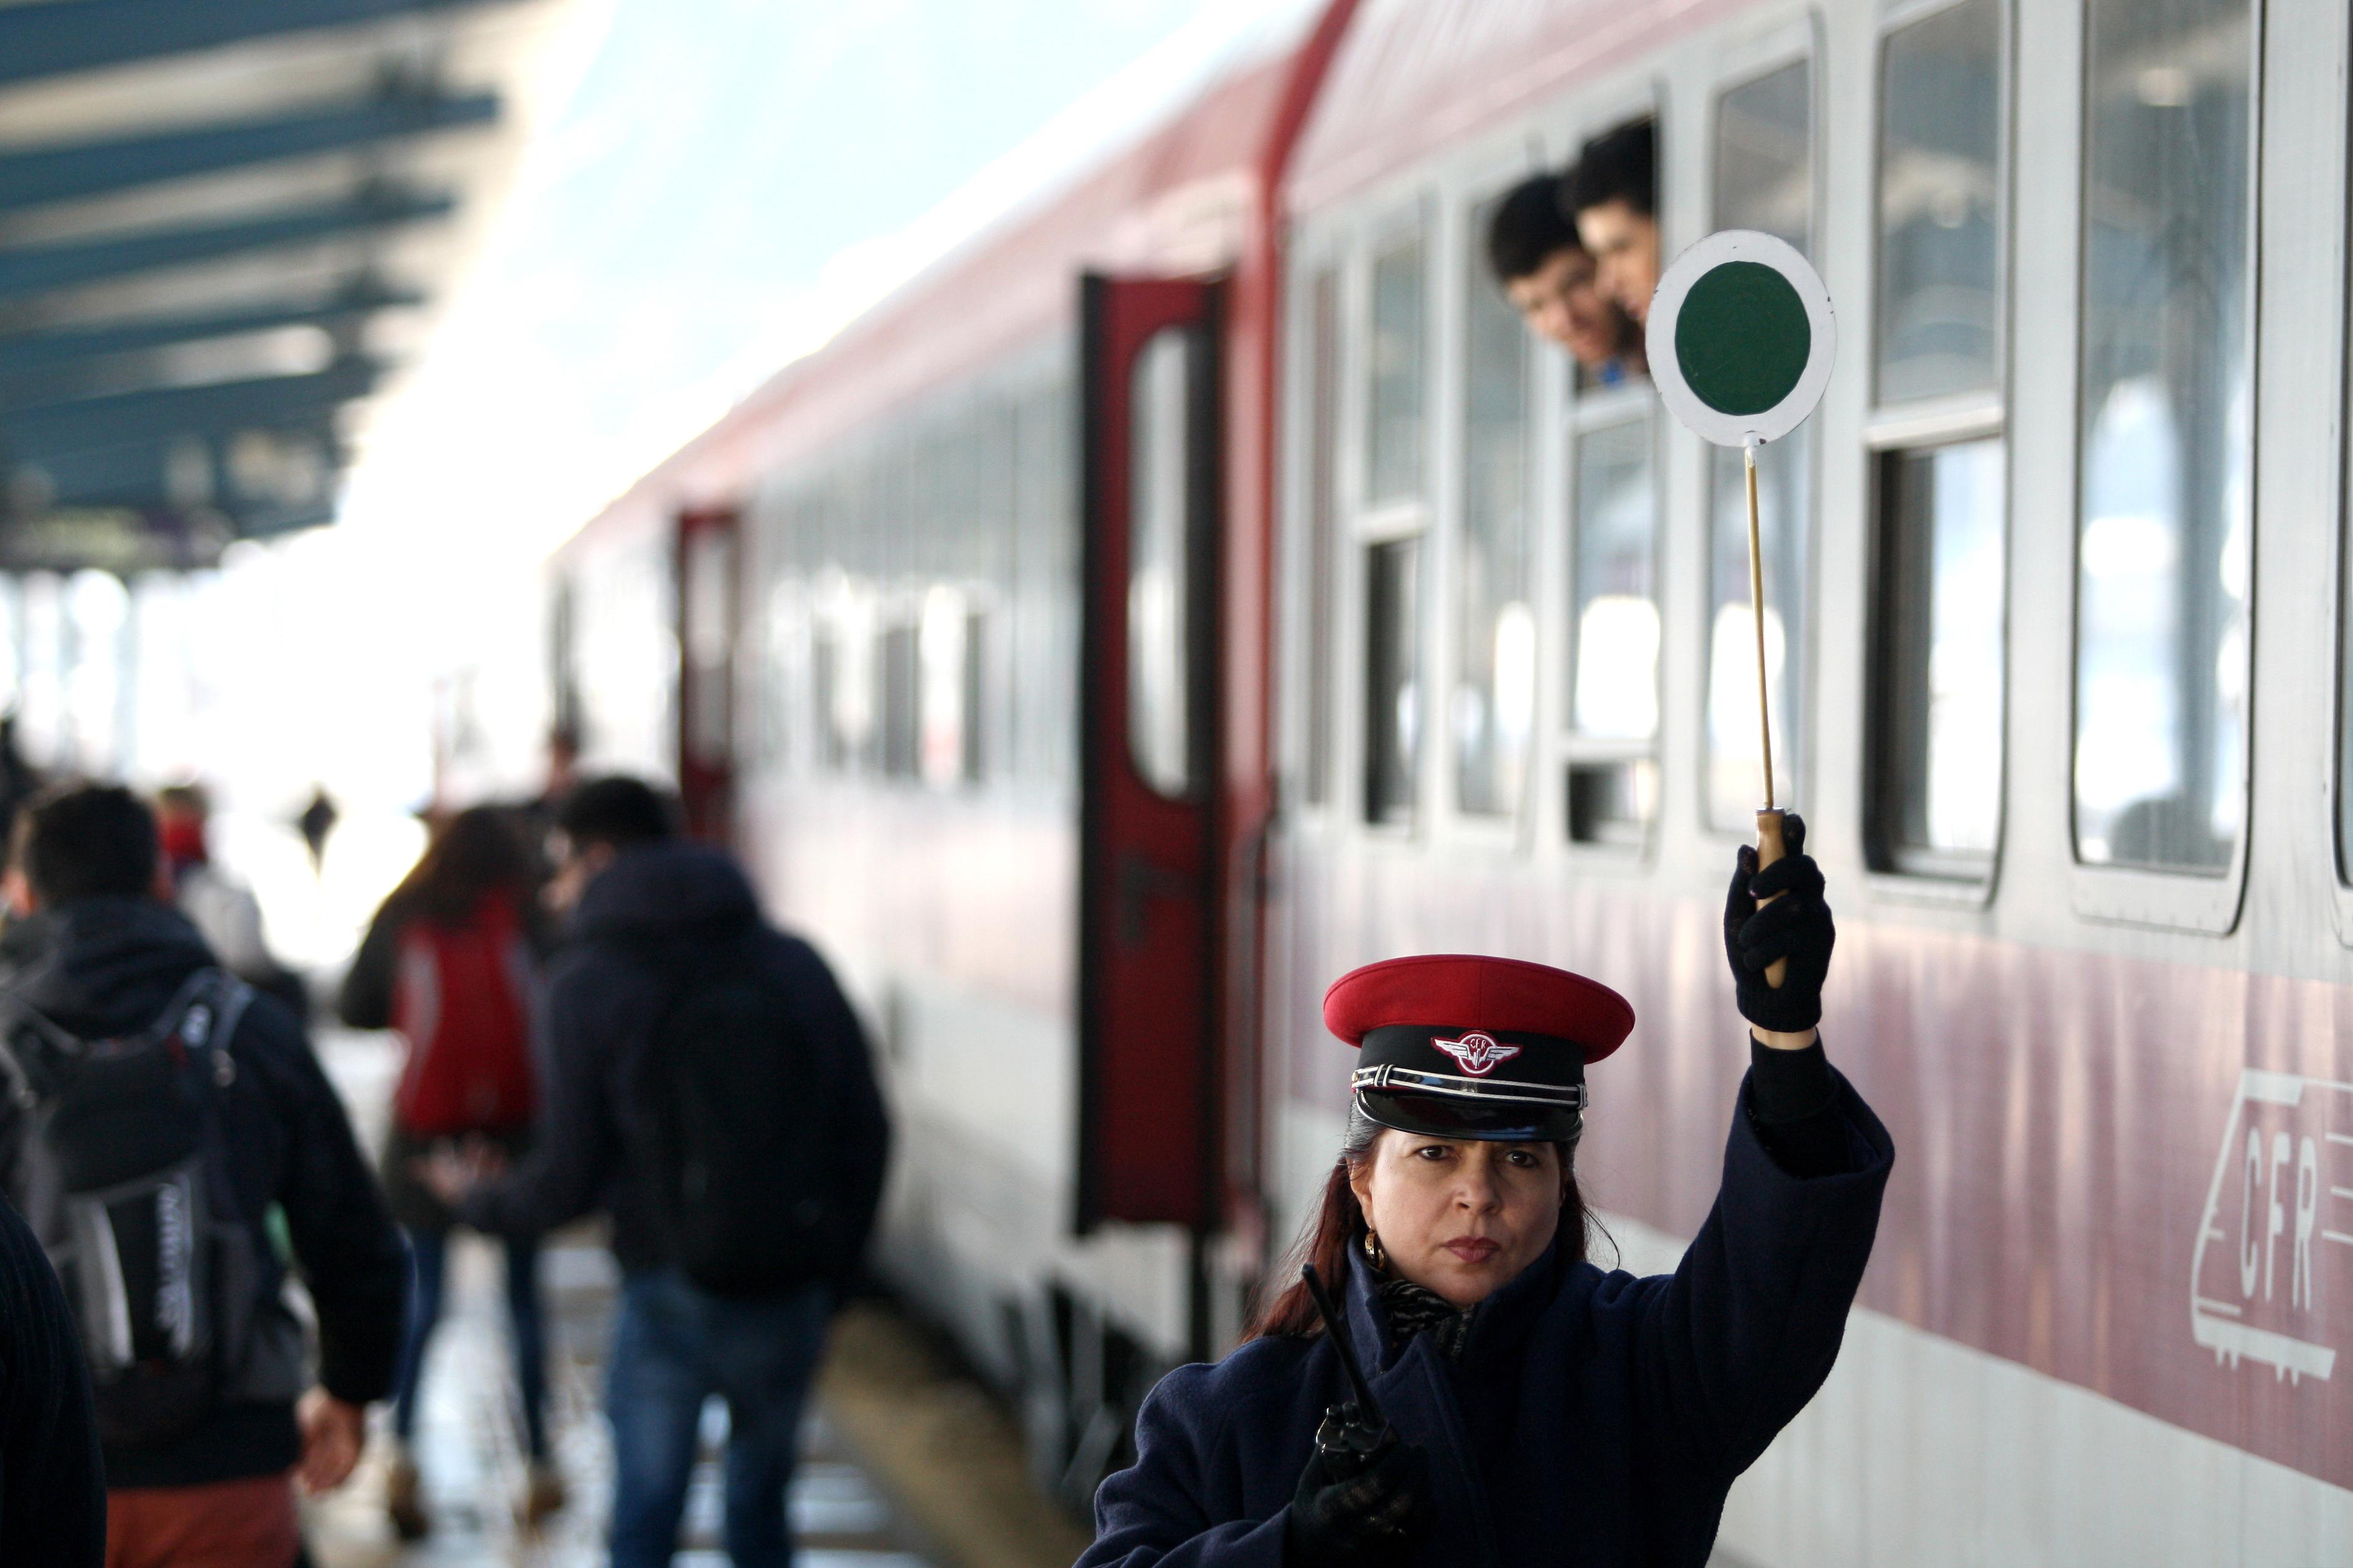 CFR Calatori: 17 trenuri vor circula suplimentar de Pasti si 1 Mai. Vezi programul